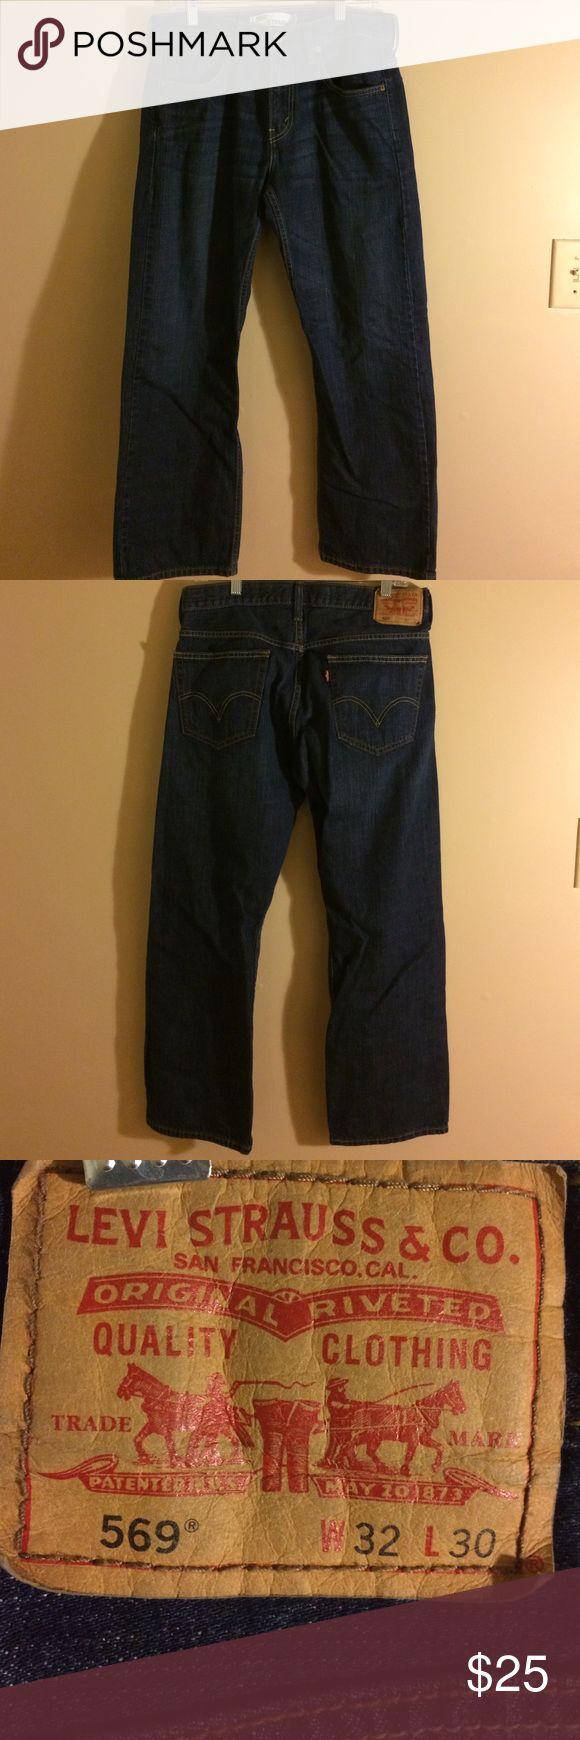 Levi's 569 jeans 32x30 Dark wash Levi's 569 loose fit straight leg. EUC smoke free home. Bundle to save more. Levi's Jeans Straight